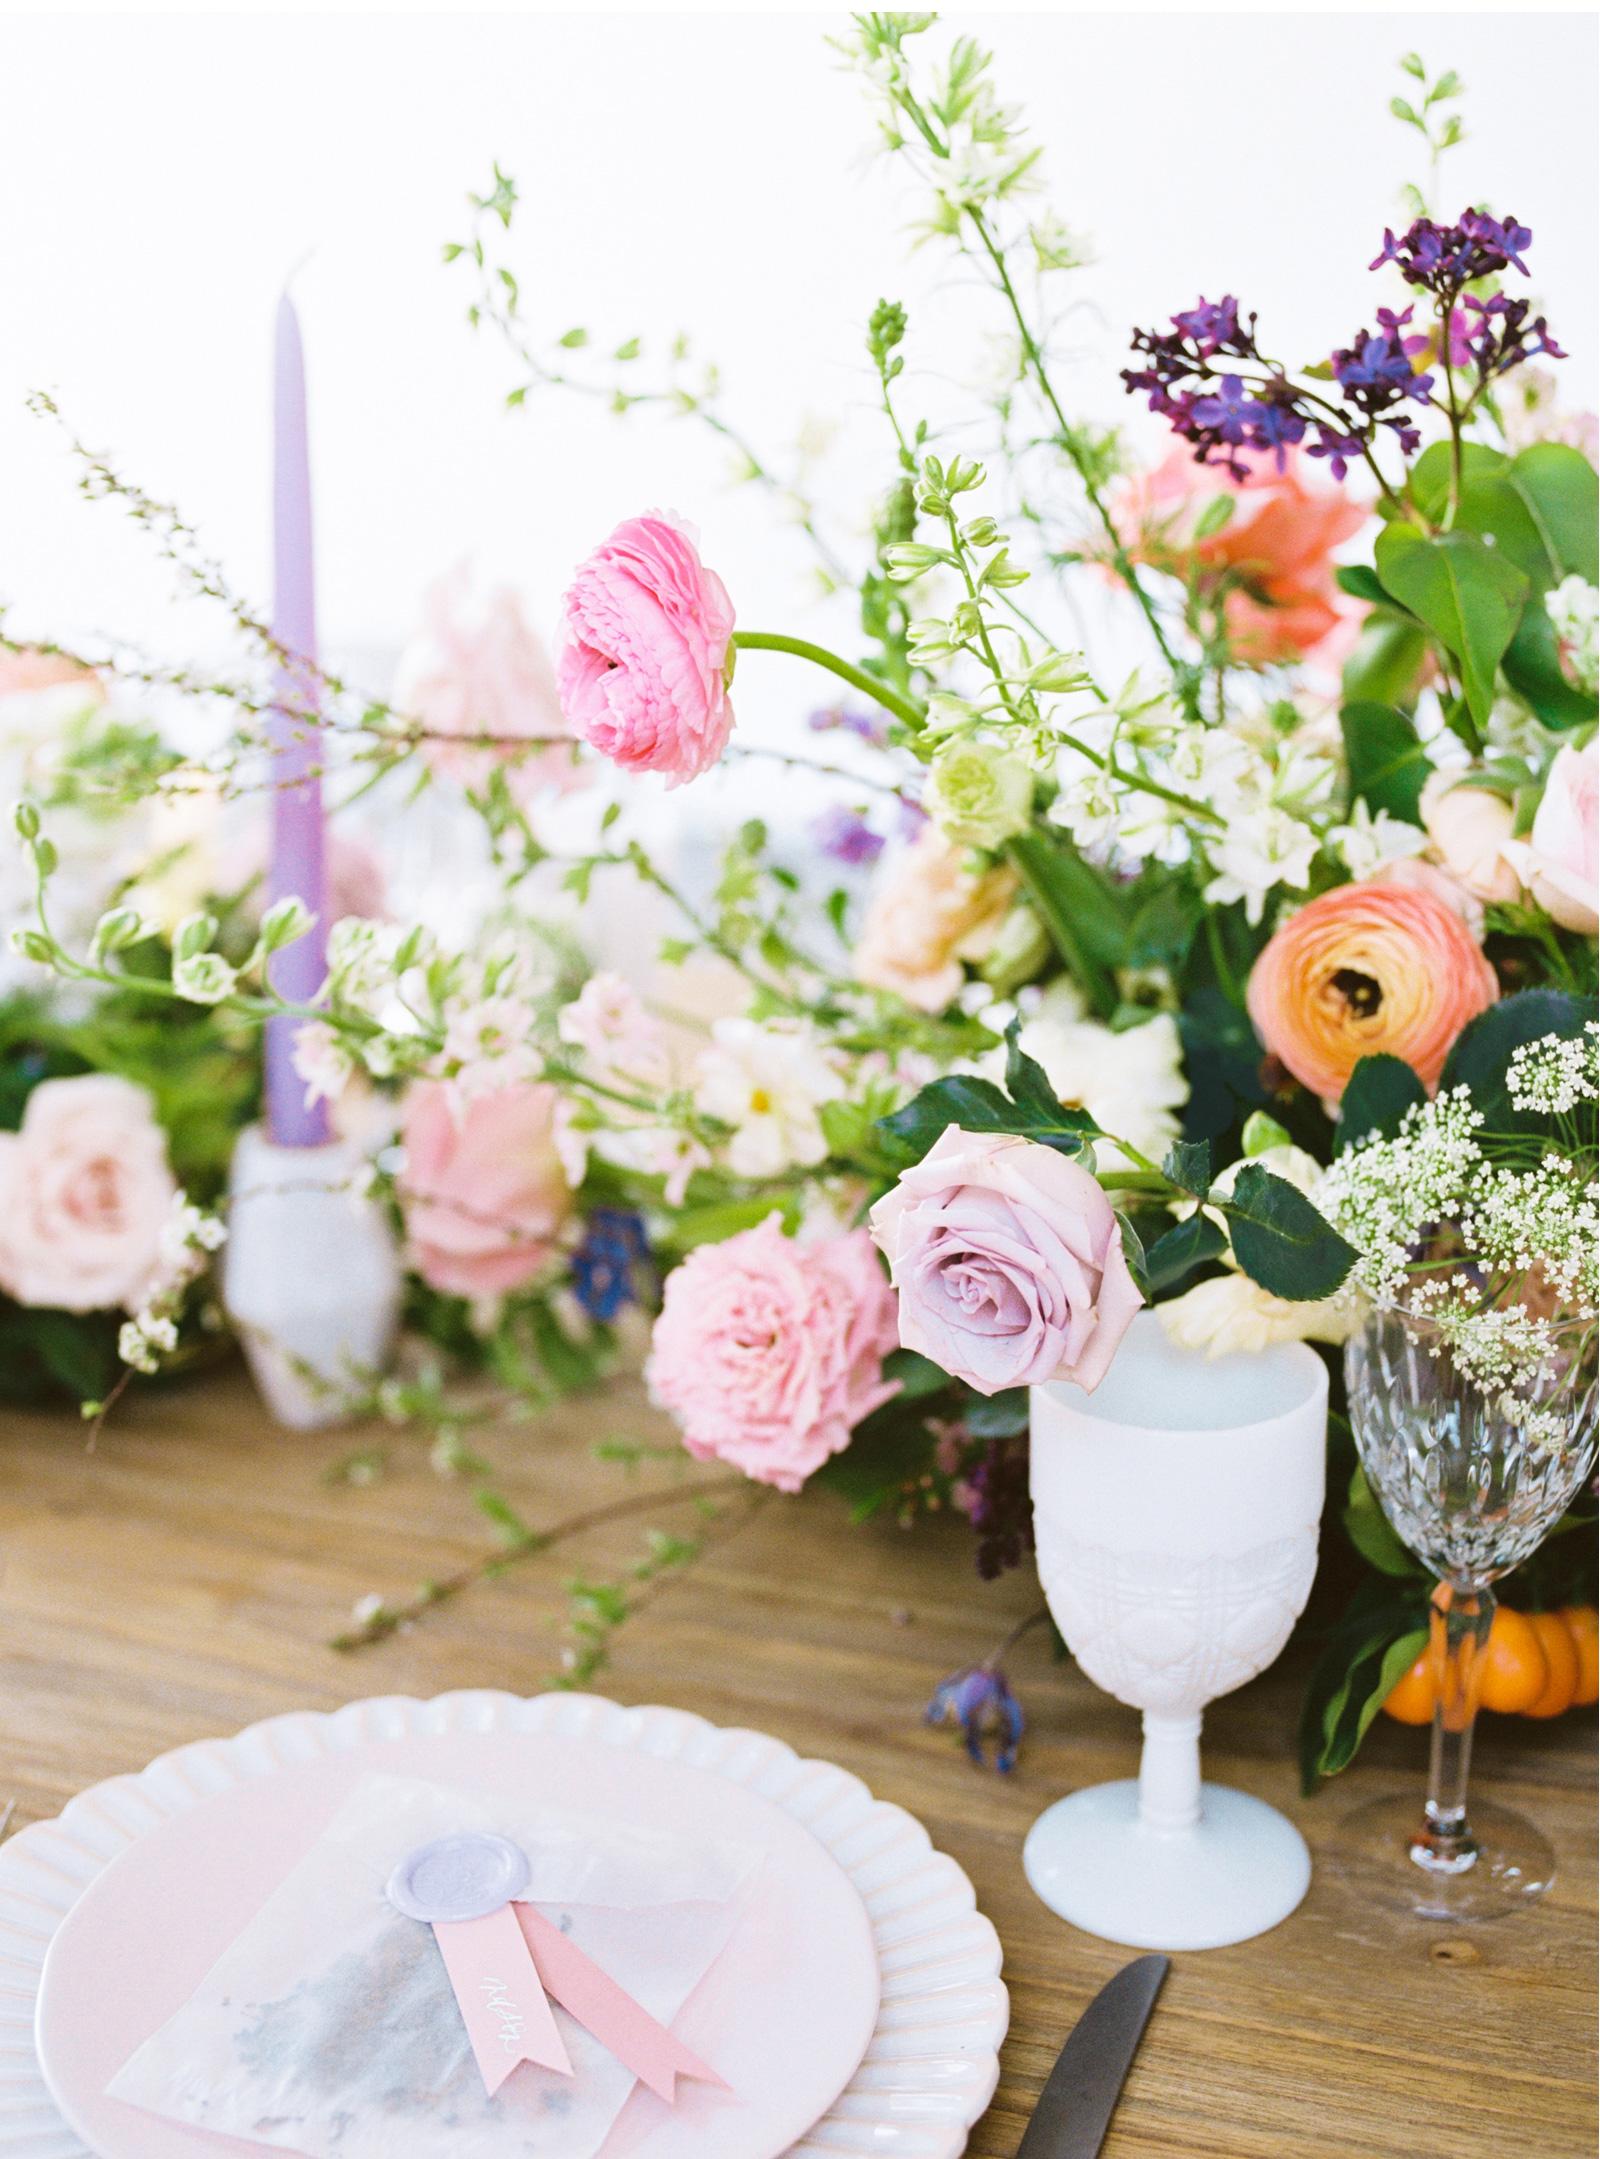 Malibu-Wedding-Photographer-Natalie-Schutt-Photography-Inspired-by-This_10.jpg